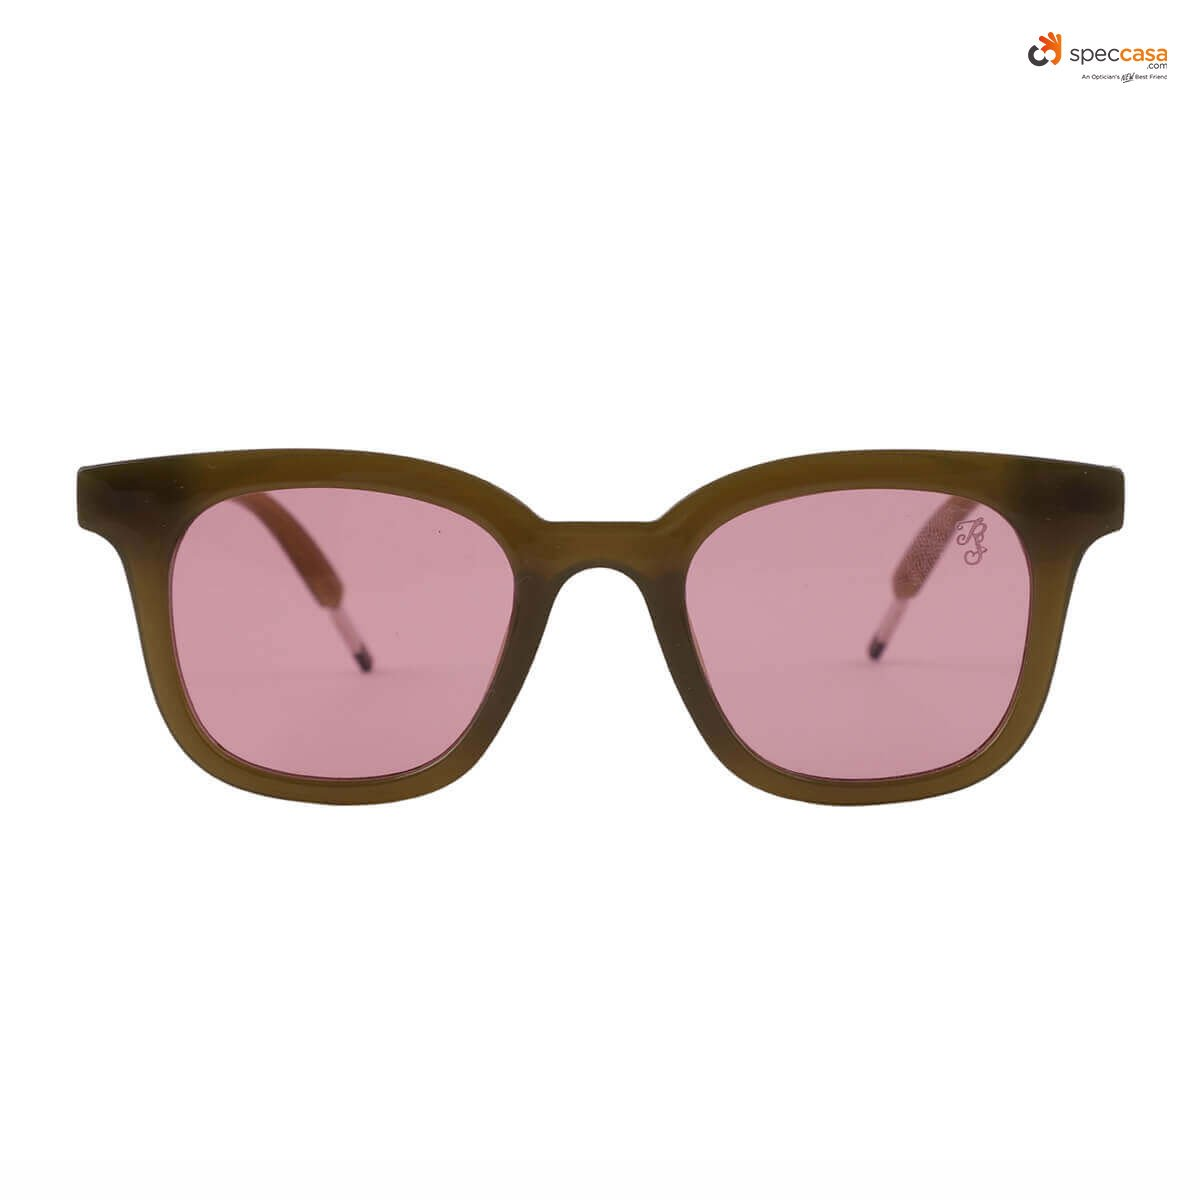 1f2d8aff9e4 Speccasa Eyewear ( speccasa)